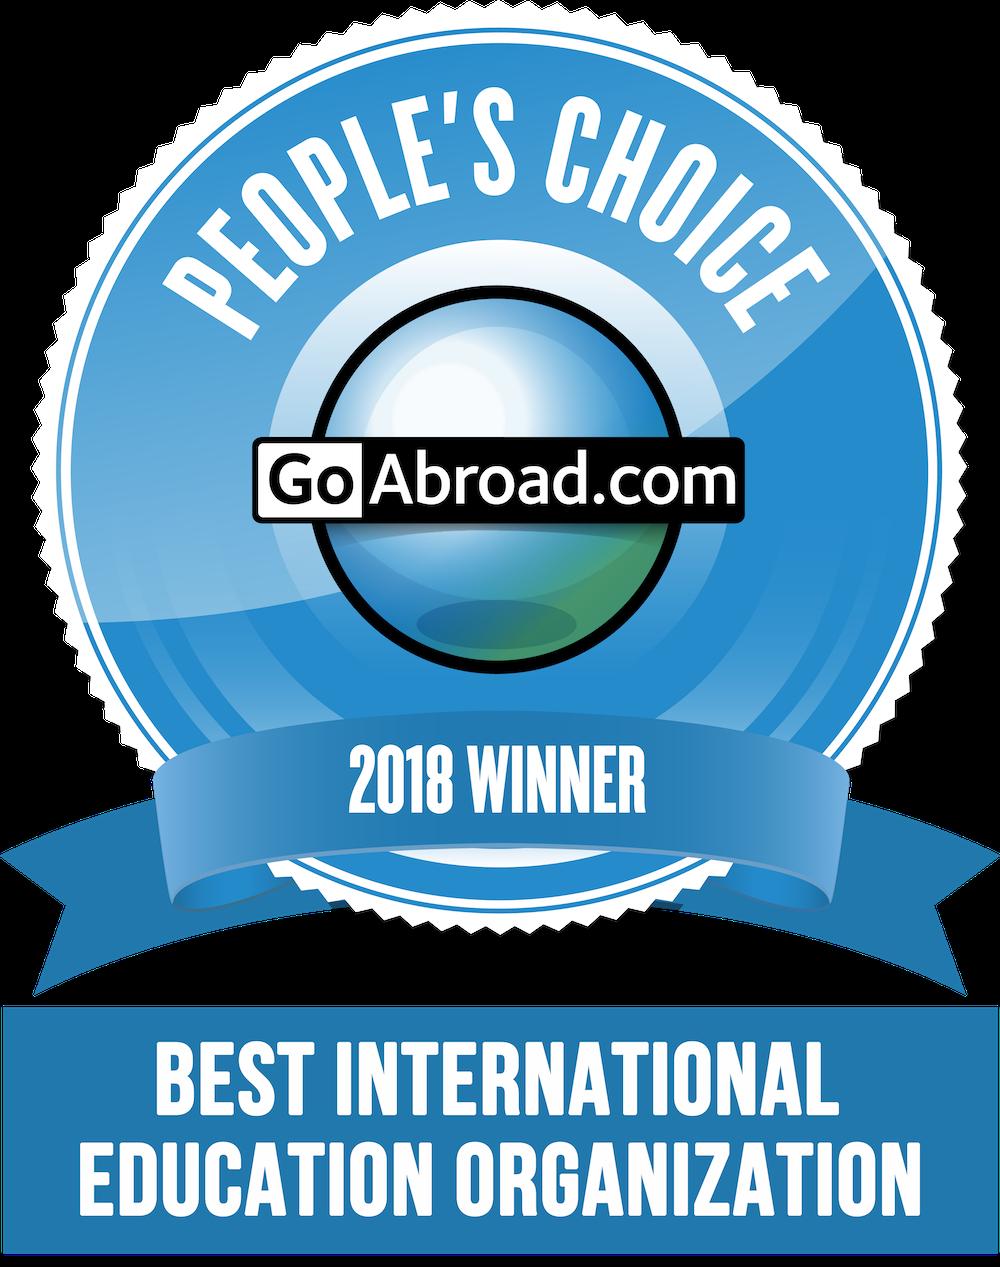 Winner of Goabroad People's choice Award 2018